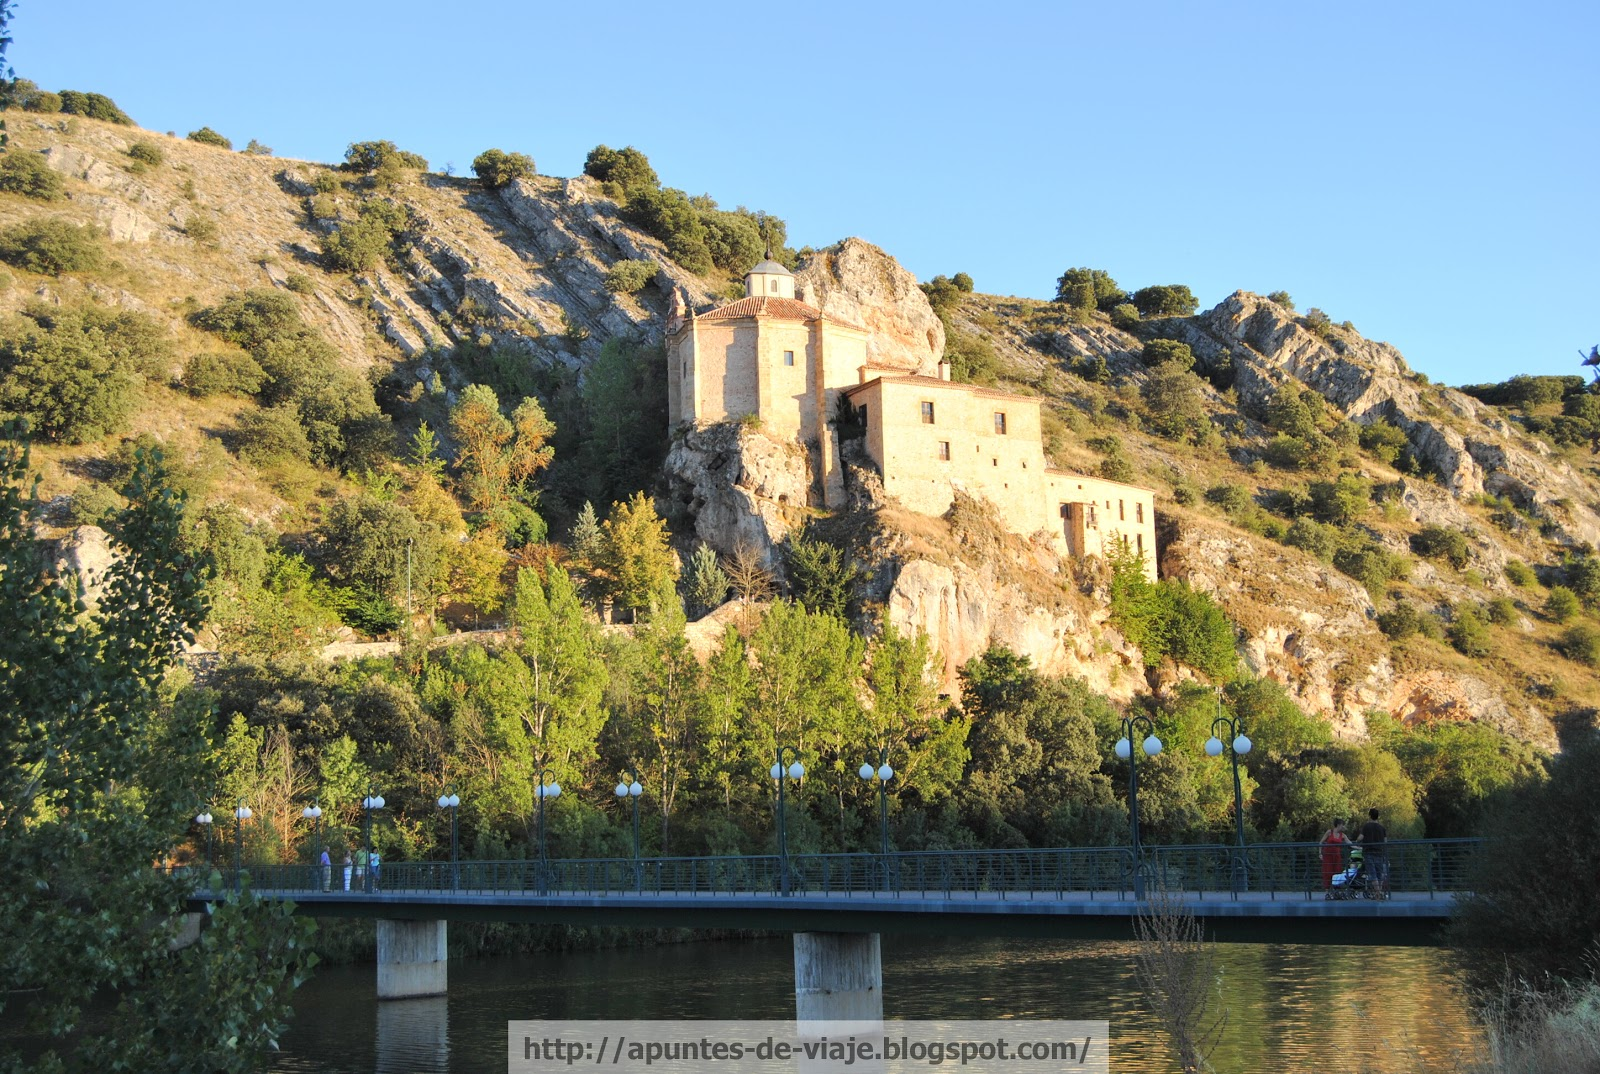 Apuntes de viaje: San Saturio